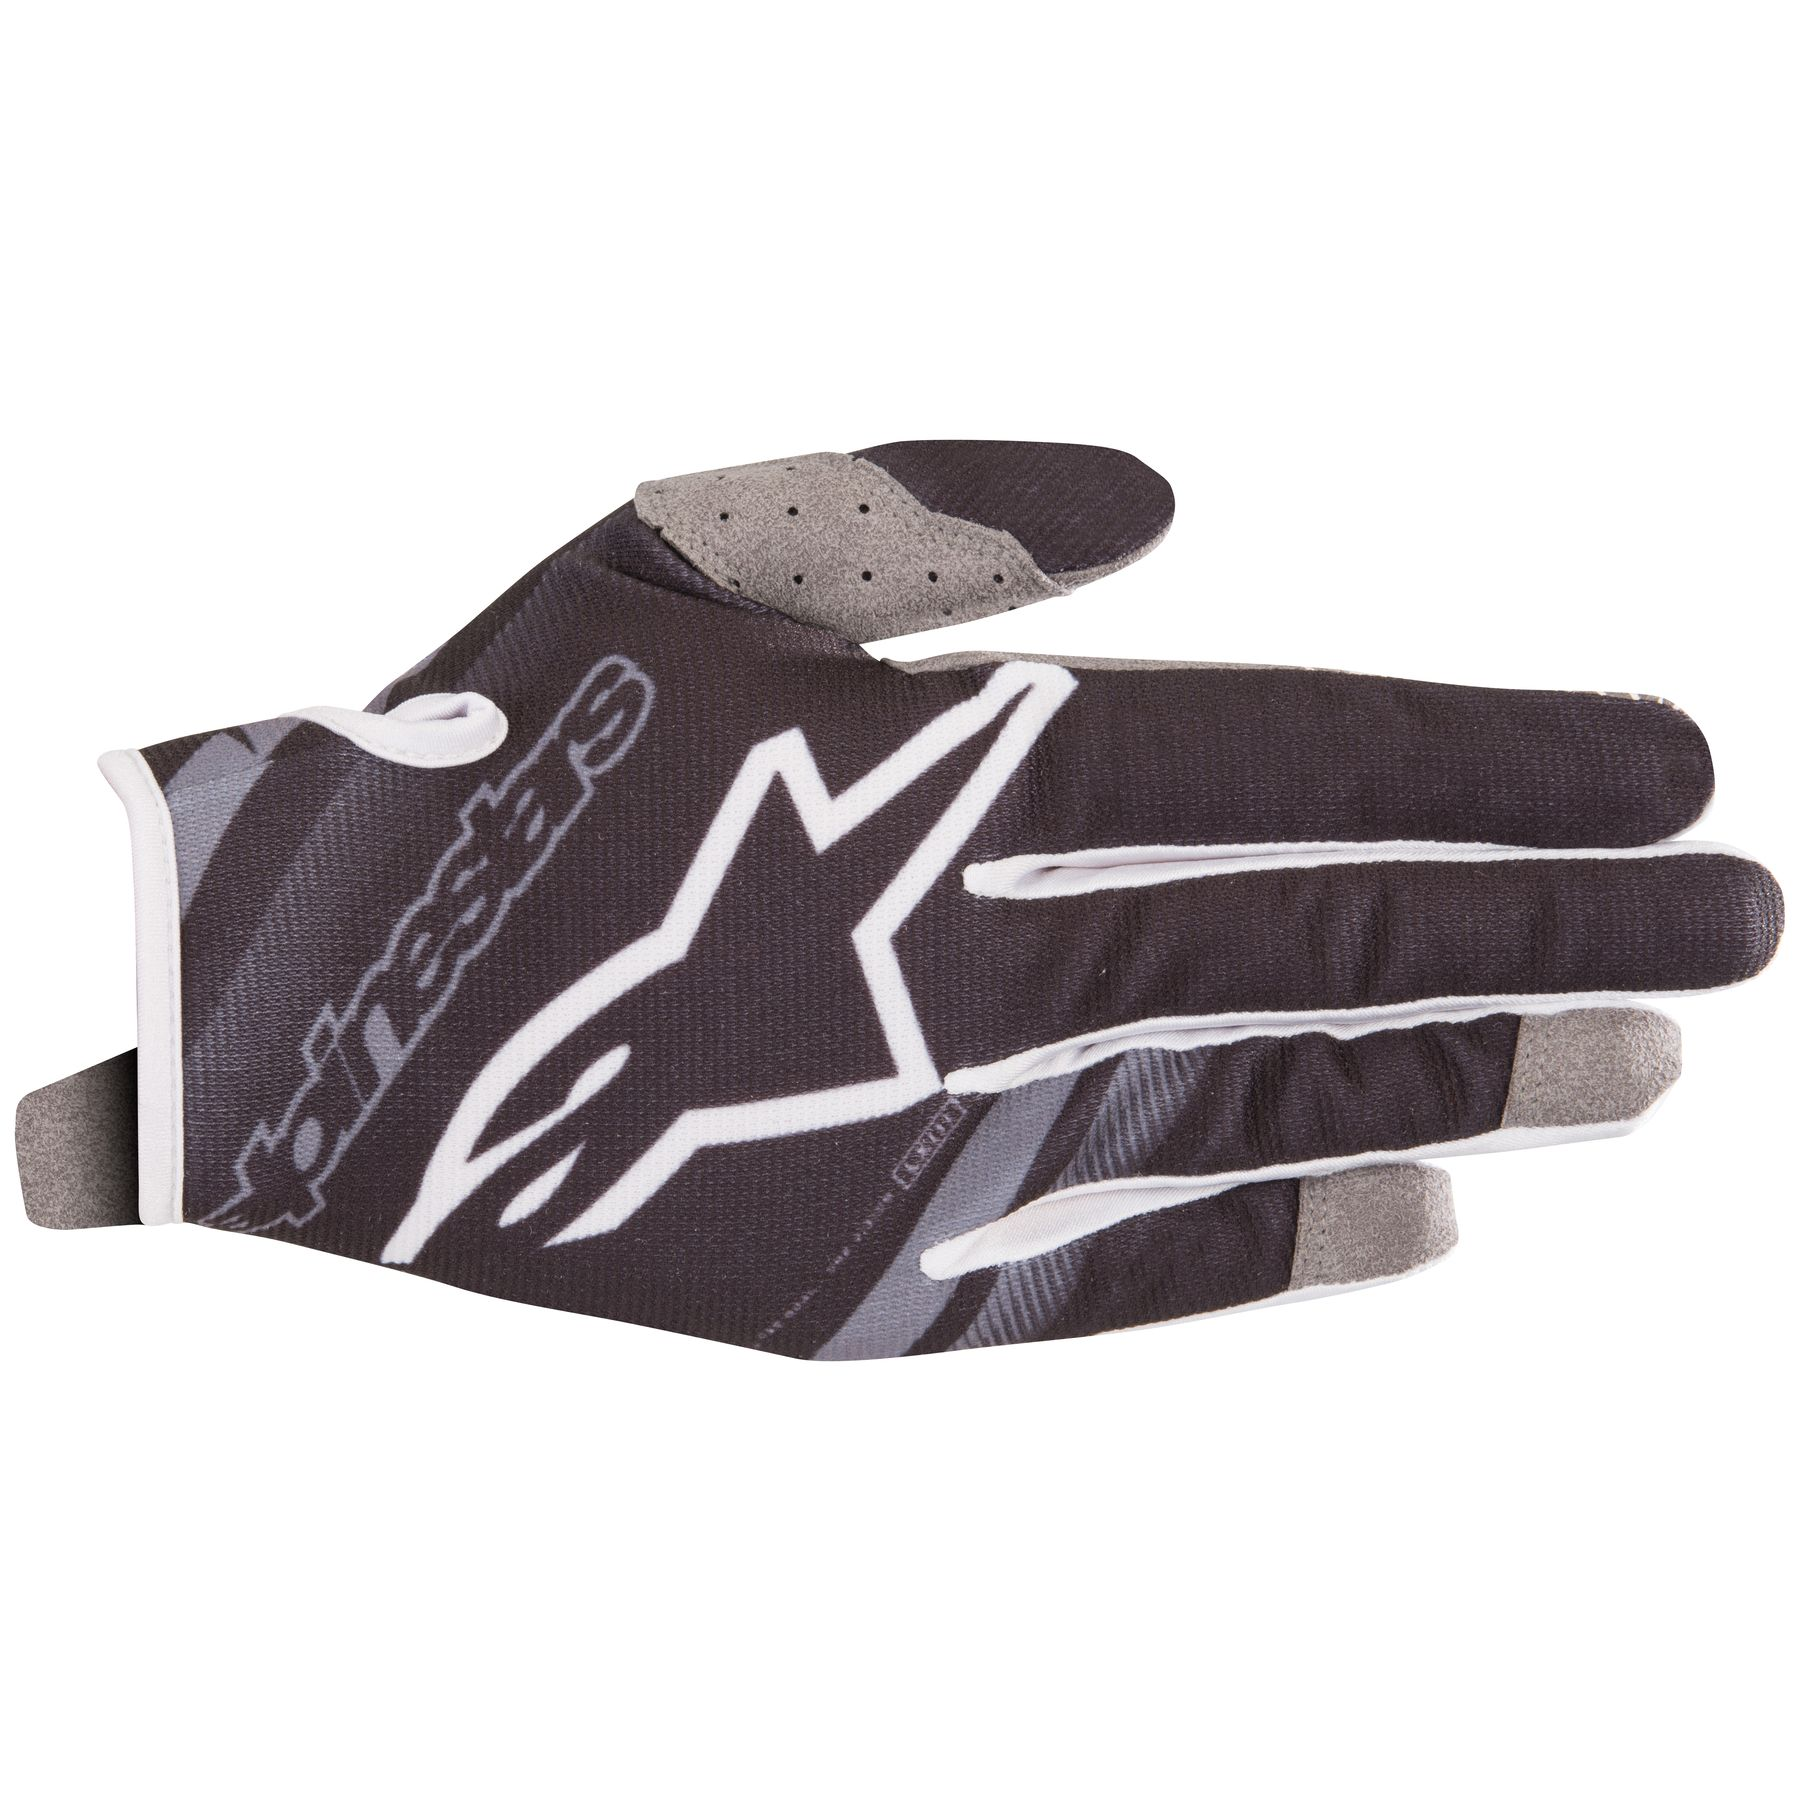 Alpinestars Youth Radar MX Offroad Gloves Black/Gray